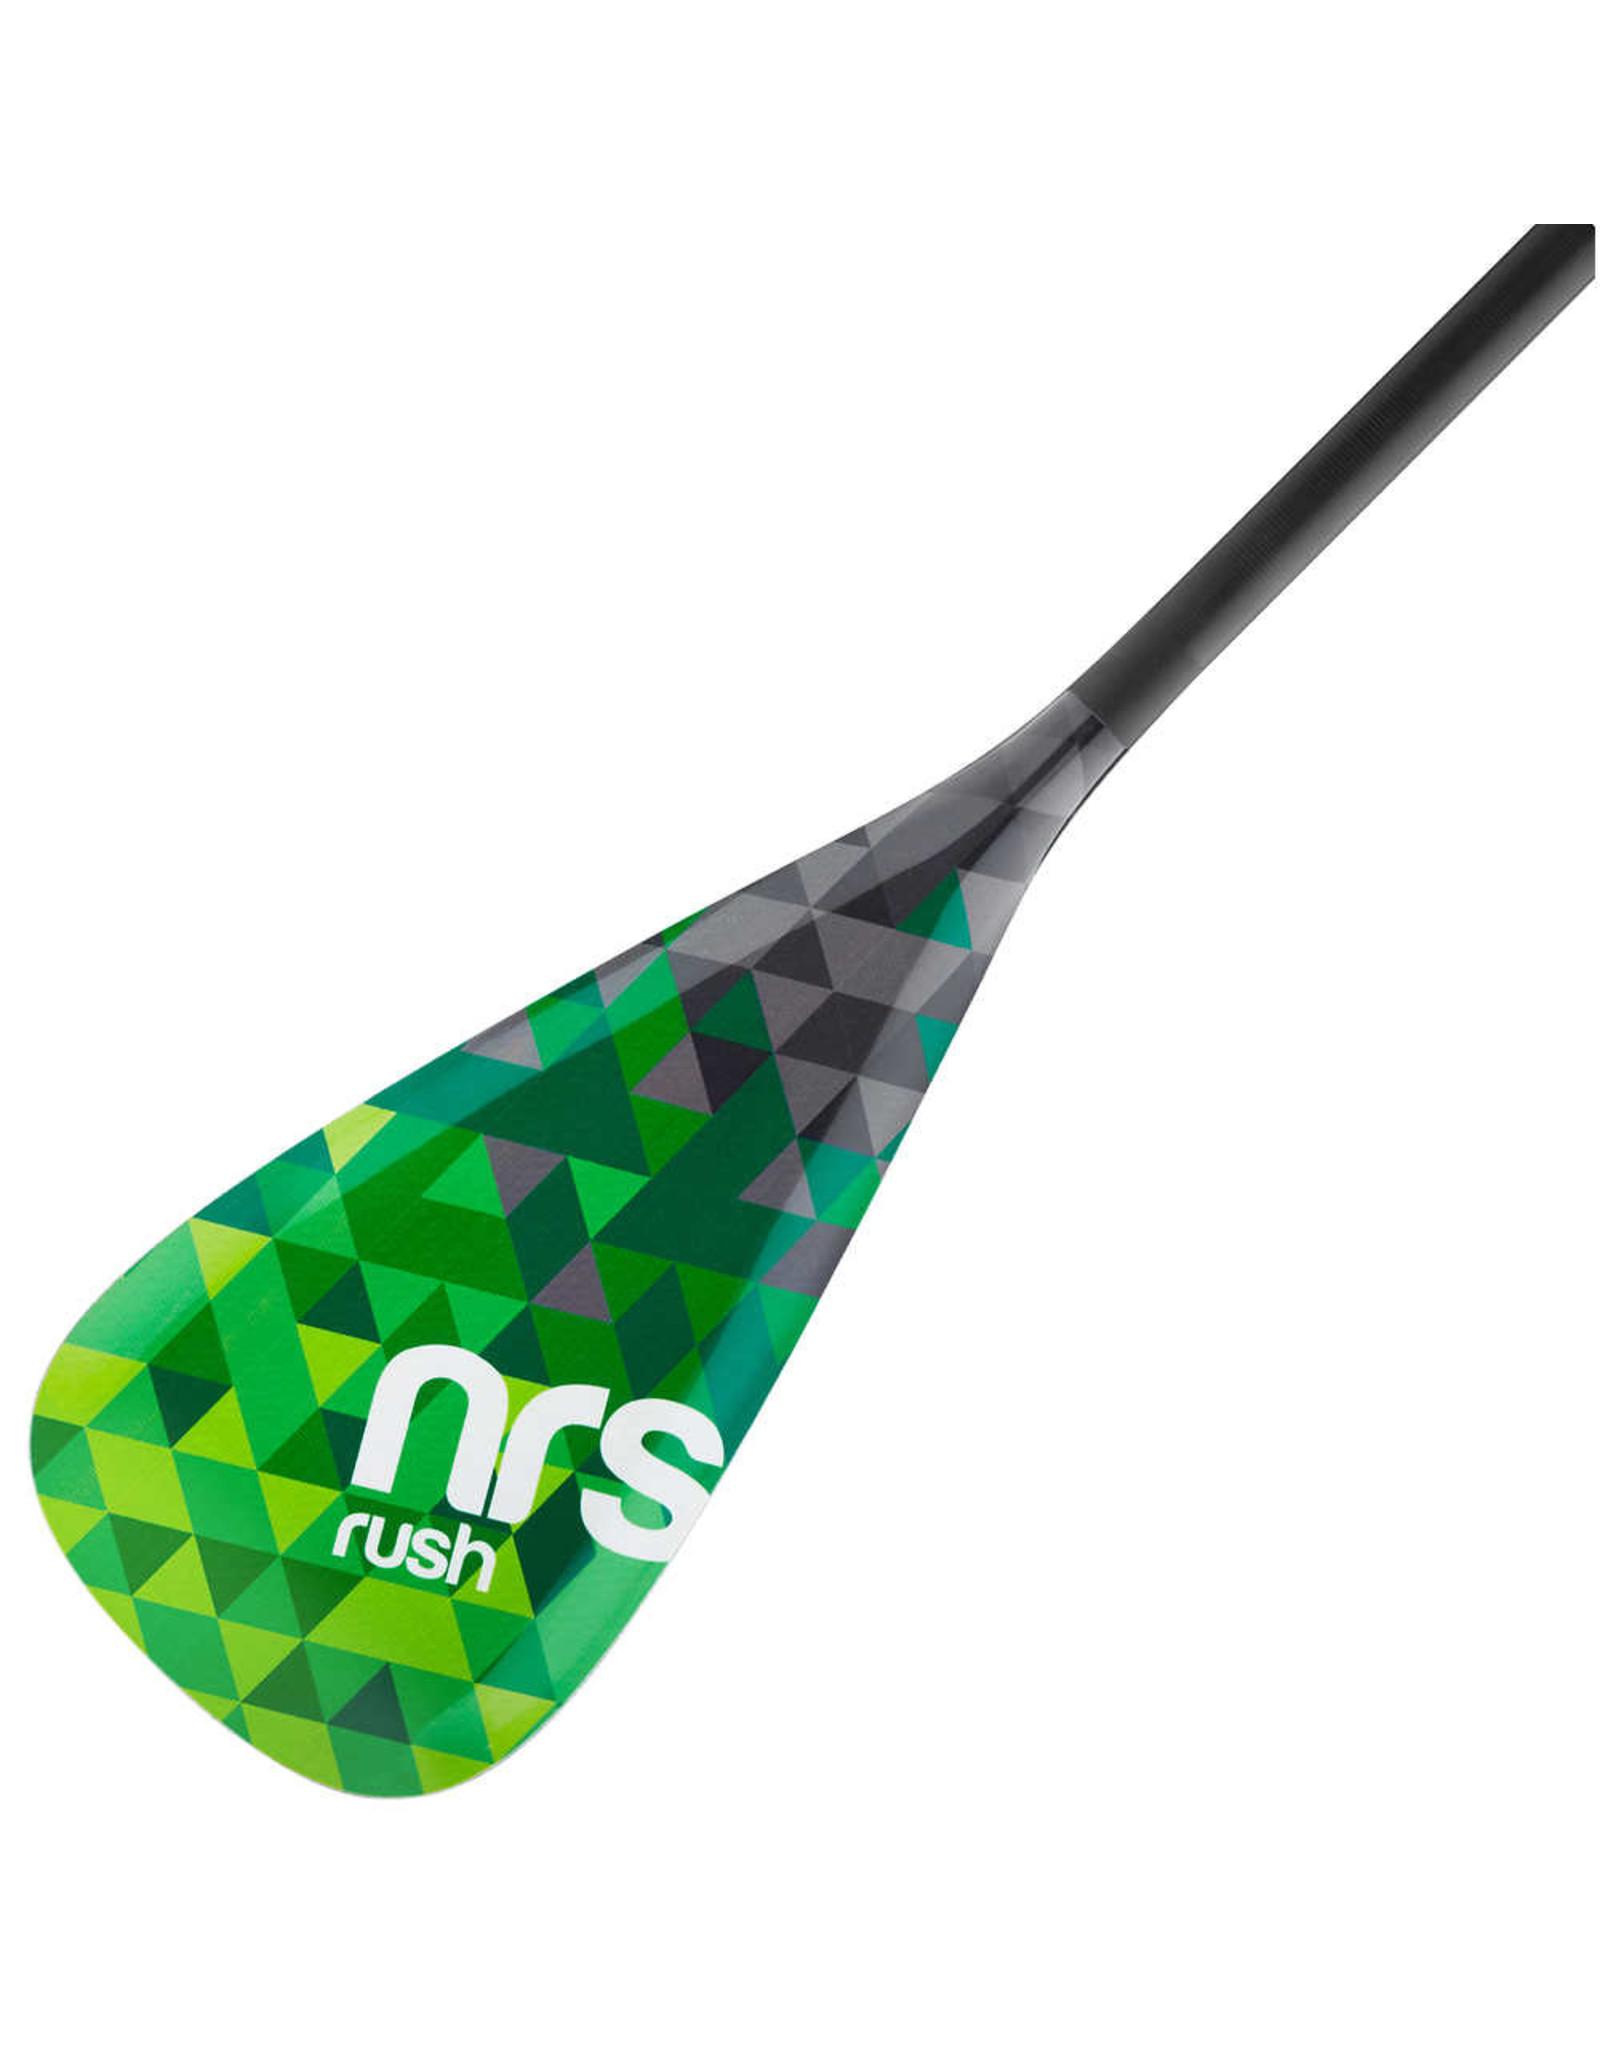 NRS NRS Rush Stand-Up Paddleboard Paddle